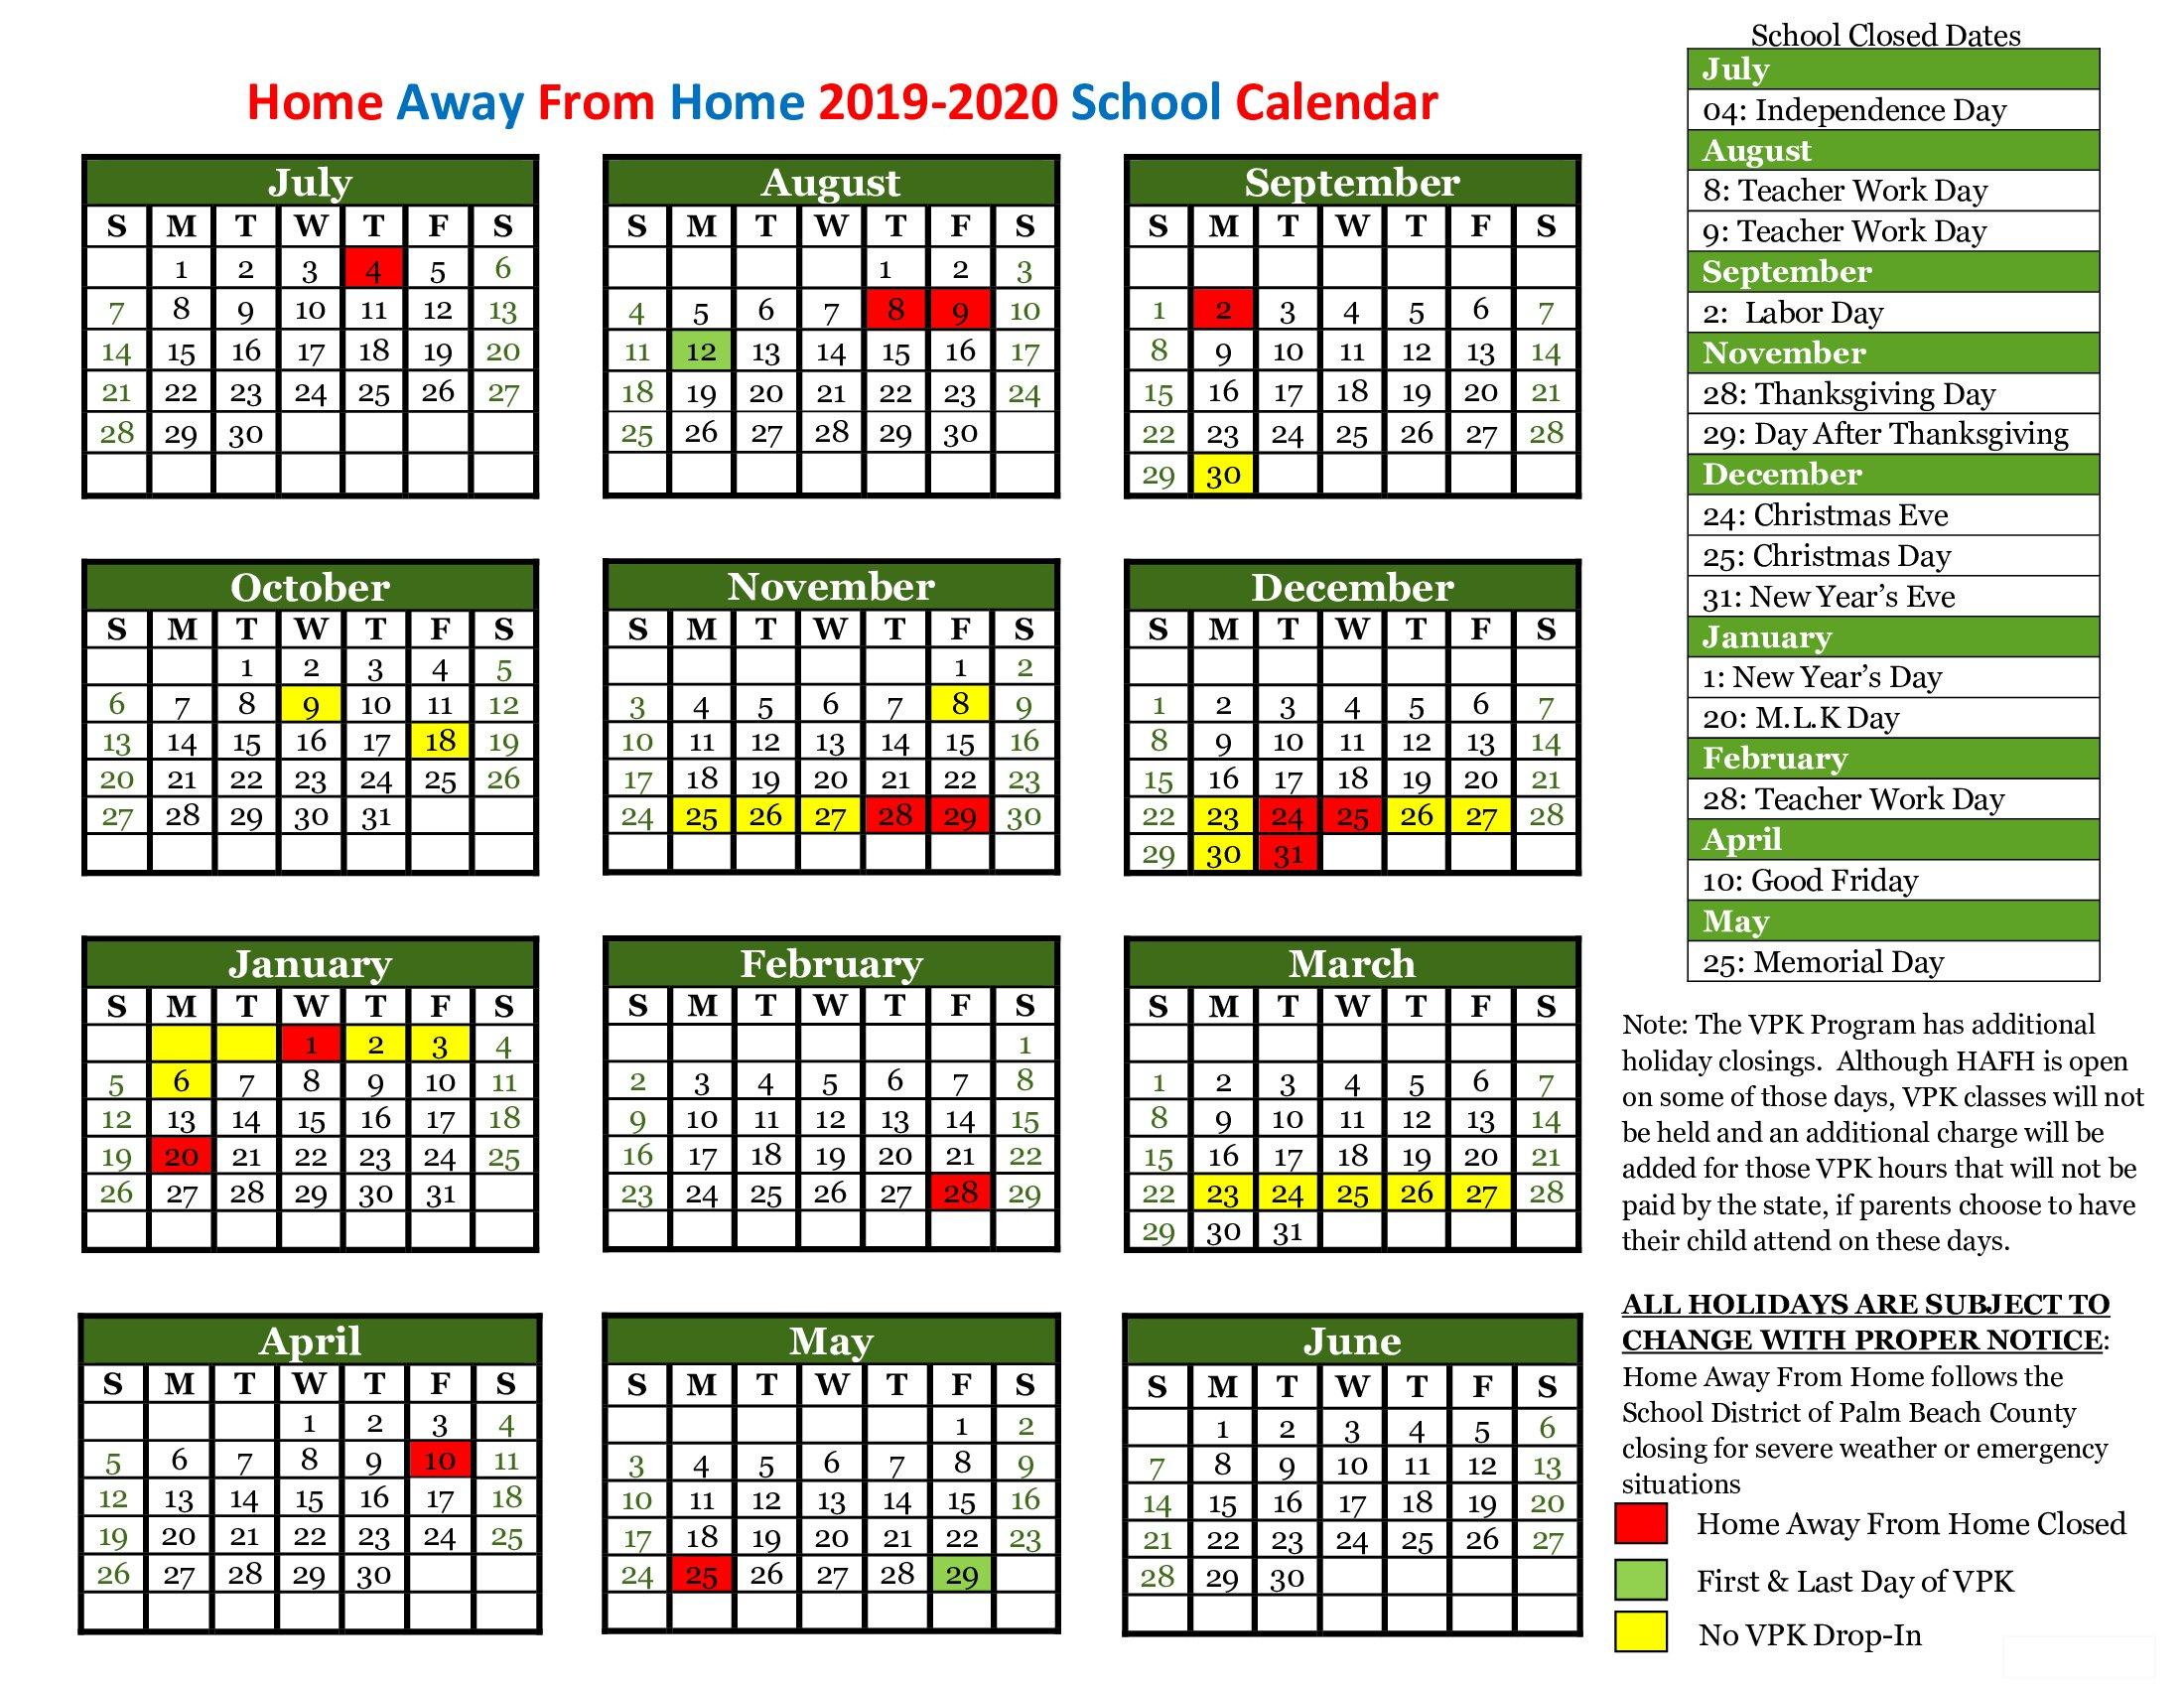 Webster Groves School District Calendar | Printable With Regard To Las Cruces Public School Calendar 2021